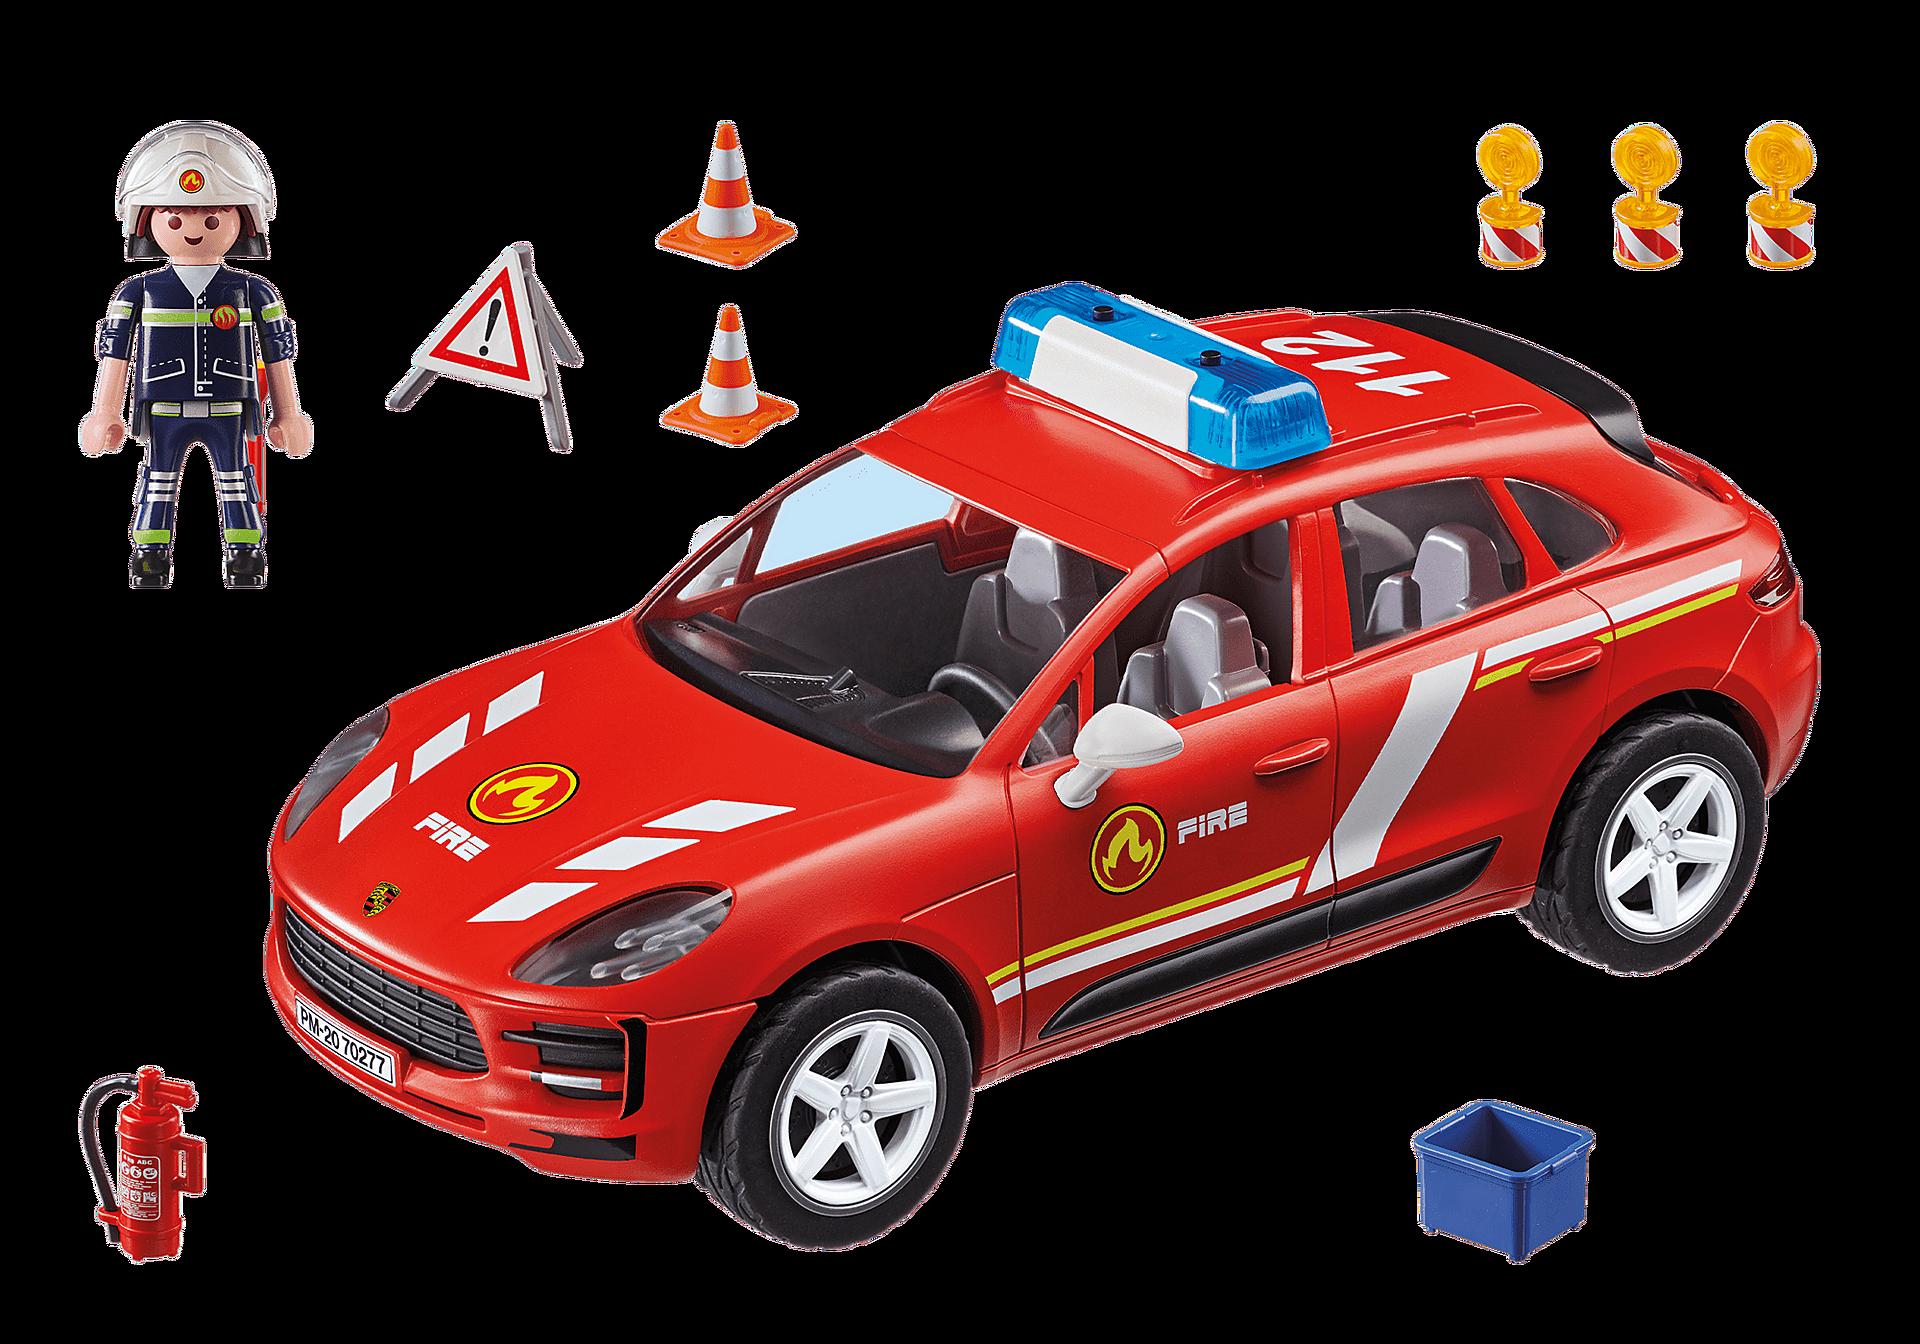 70277 Porsche Macan Fire Brigade zoom image3